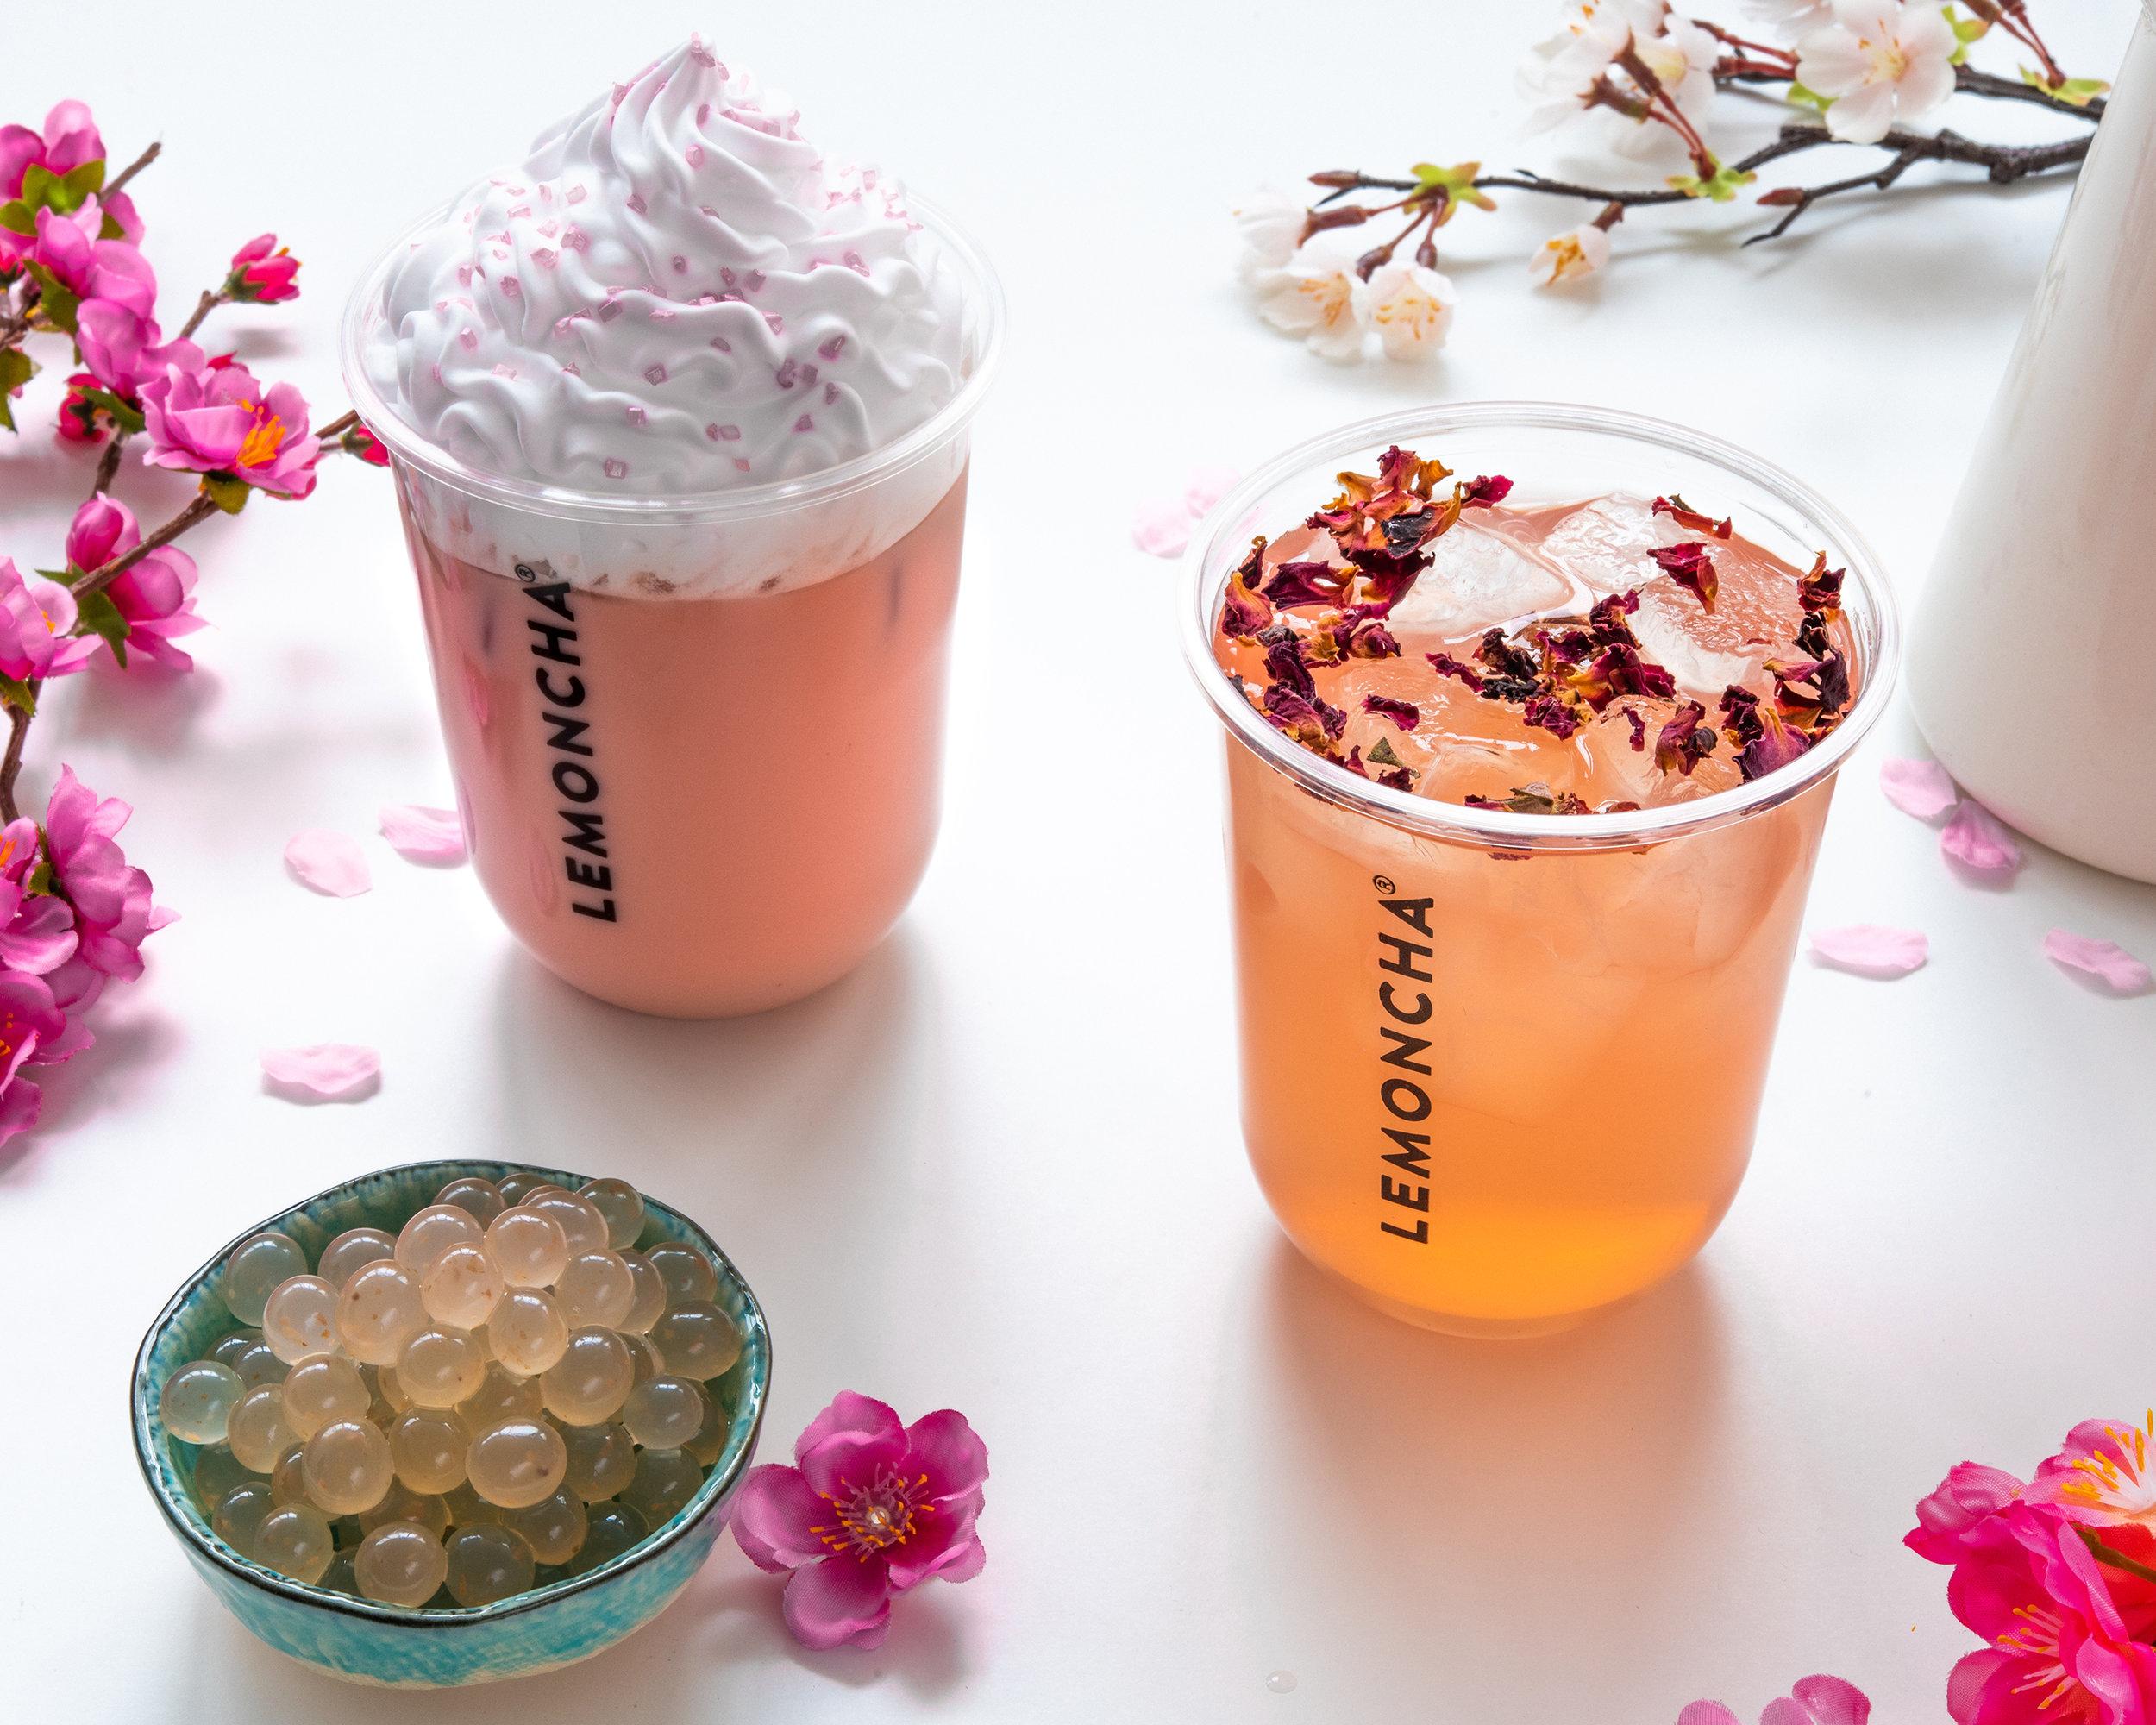 Lemoncha Limited Hanami Drinks 2019